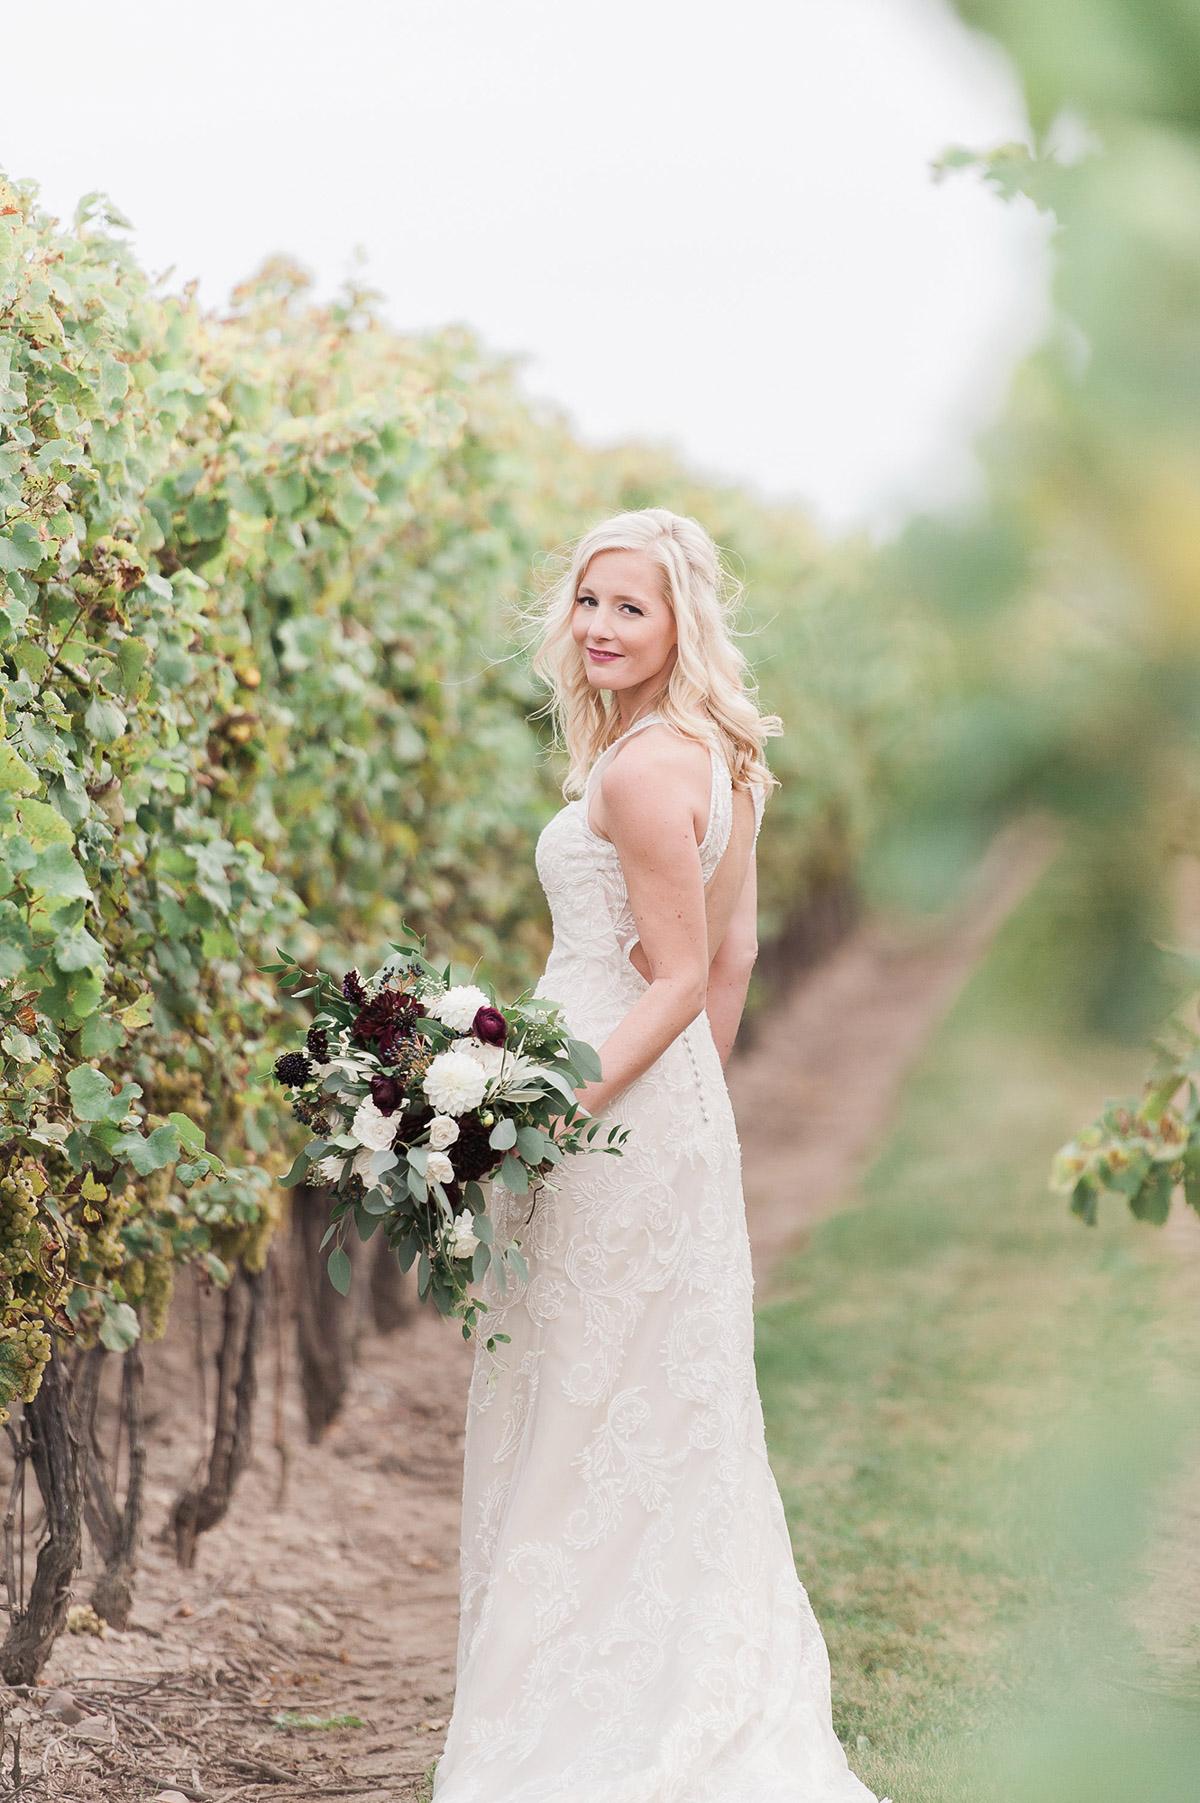 gemini-photography-vineyard-bride-swish-list-honsberger-estates-jordan-wedding-36.jpg